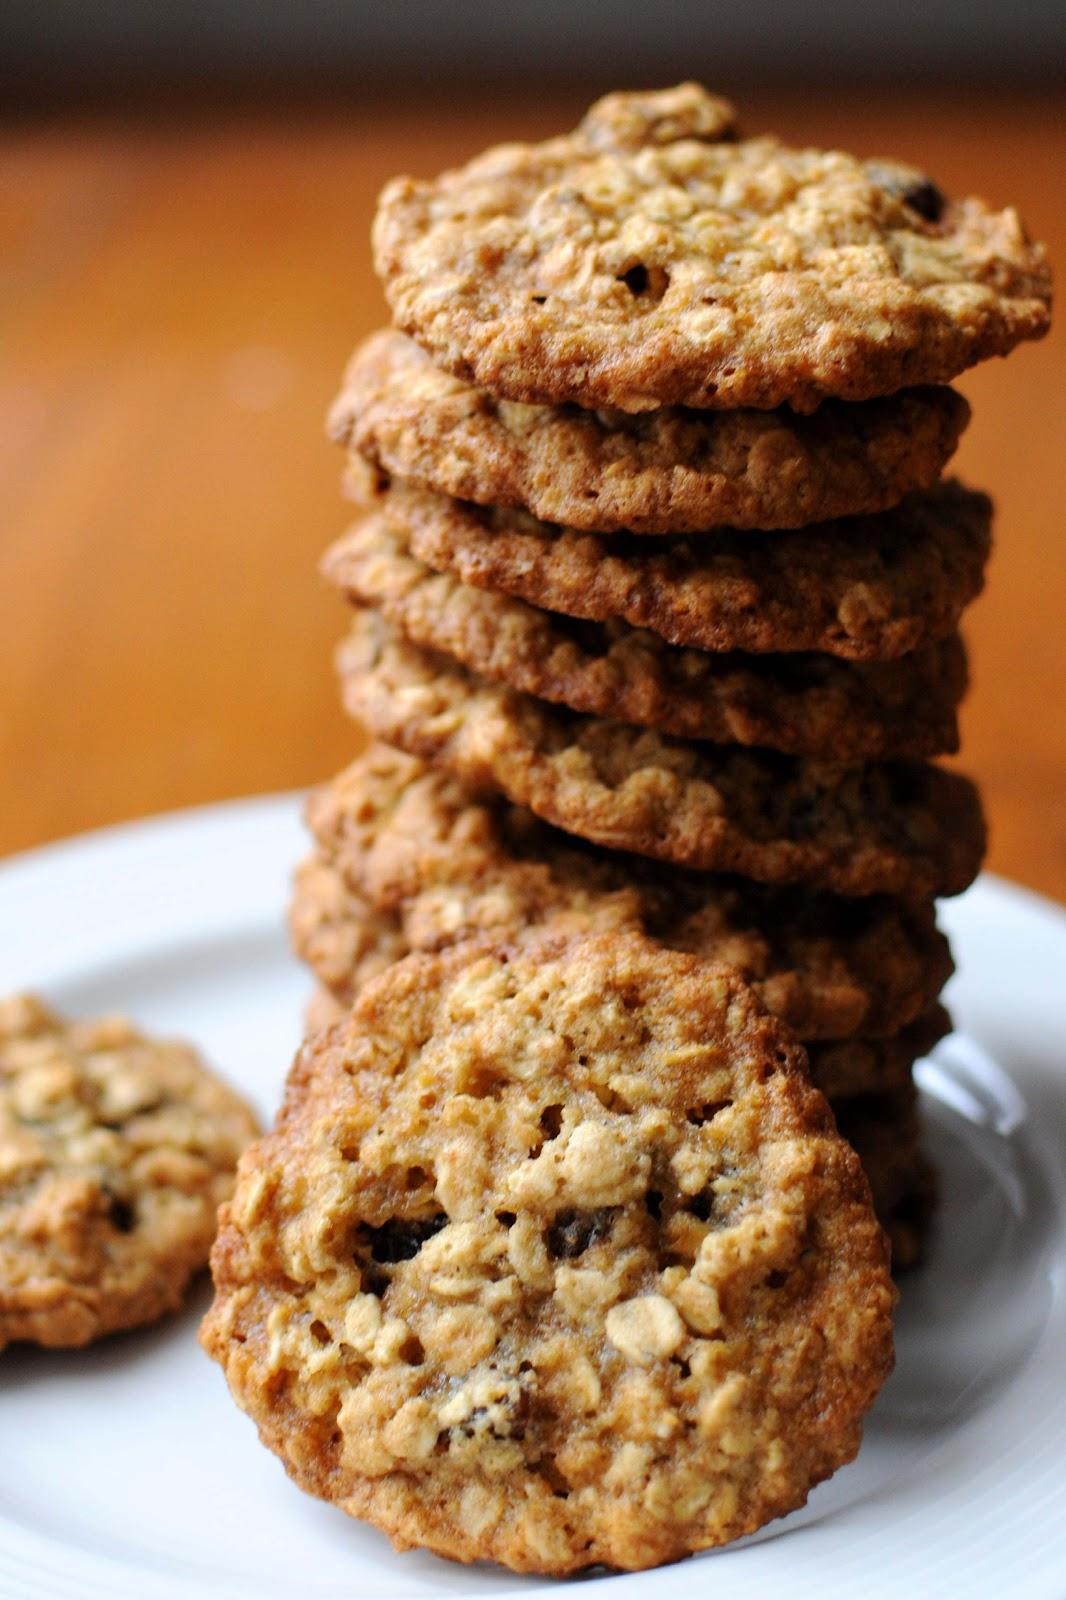 Sweet make me Smile ..: Raisin Oatmeal & Maple syrup cookies